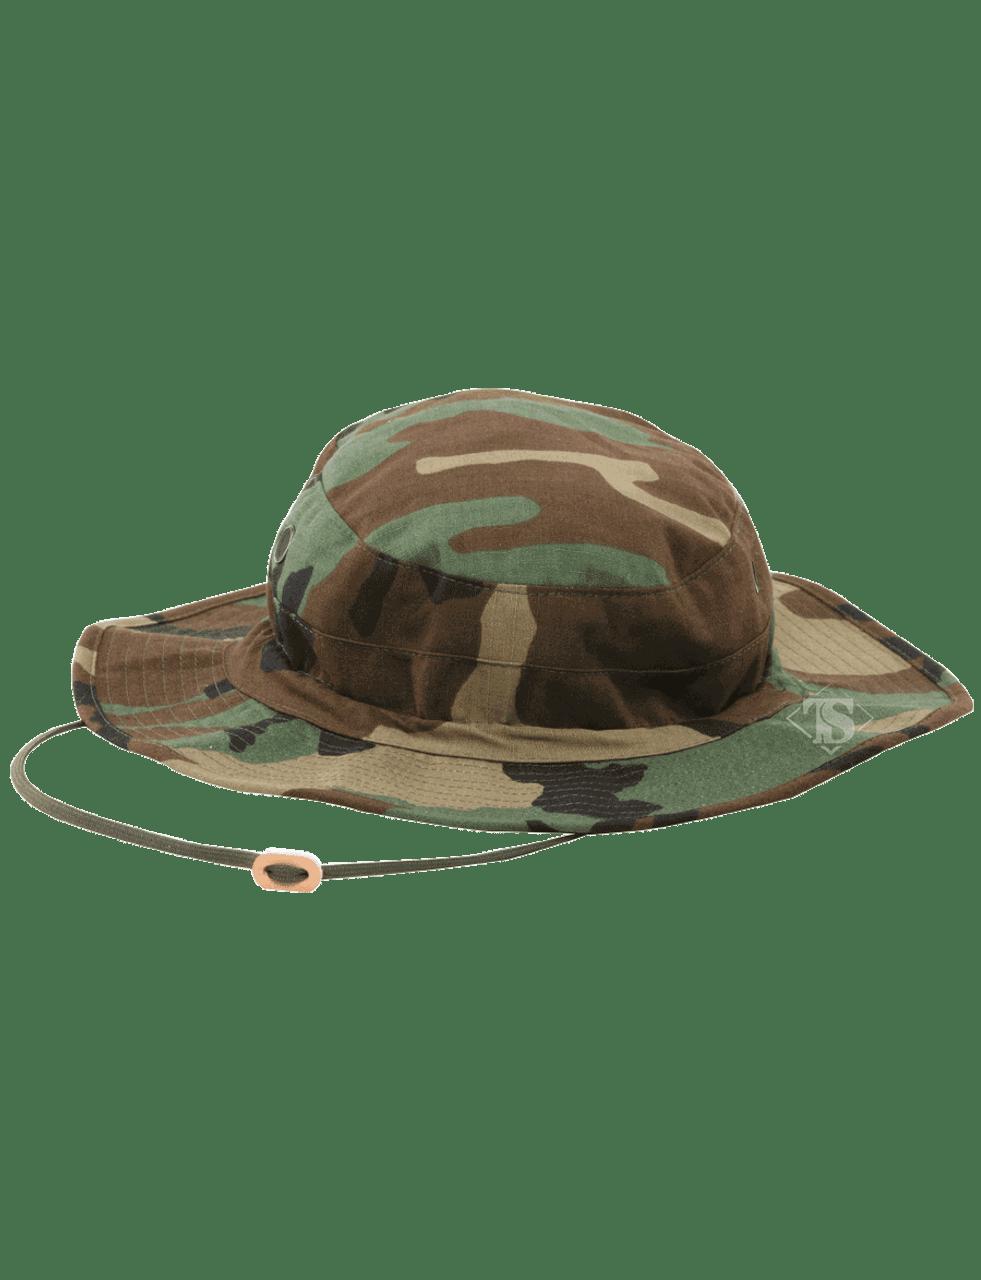 Tru-Spec - GEN 2 Adjustable Boonie Hat (Woodland) e032a7746cc